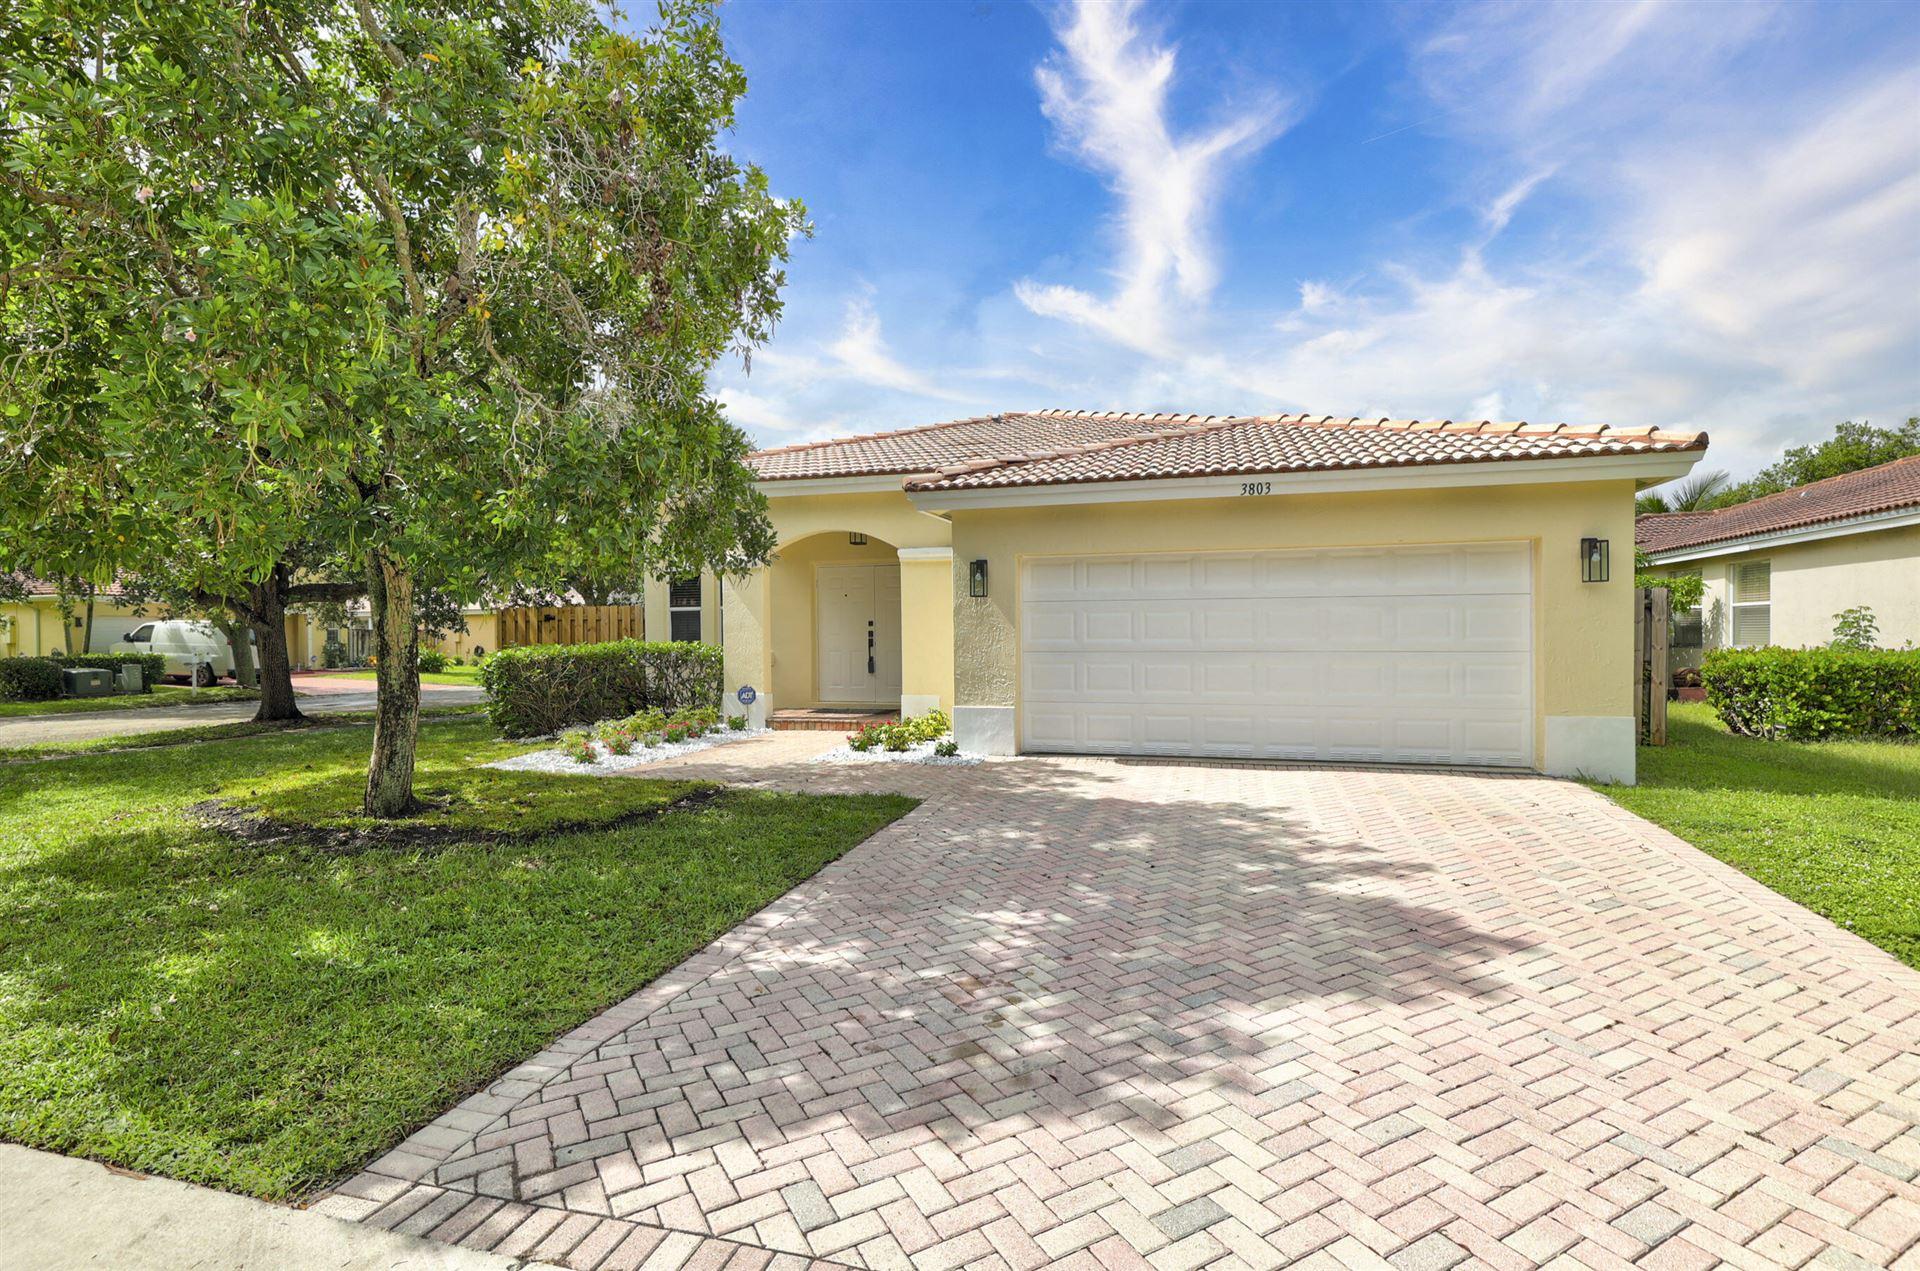 3803 NW 42nd Way, Coconut Creek, FL 33073 - #: RX-10754300